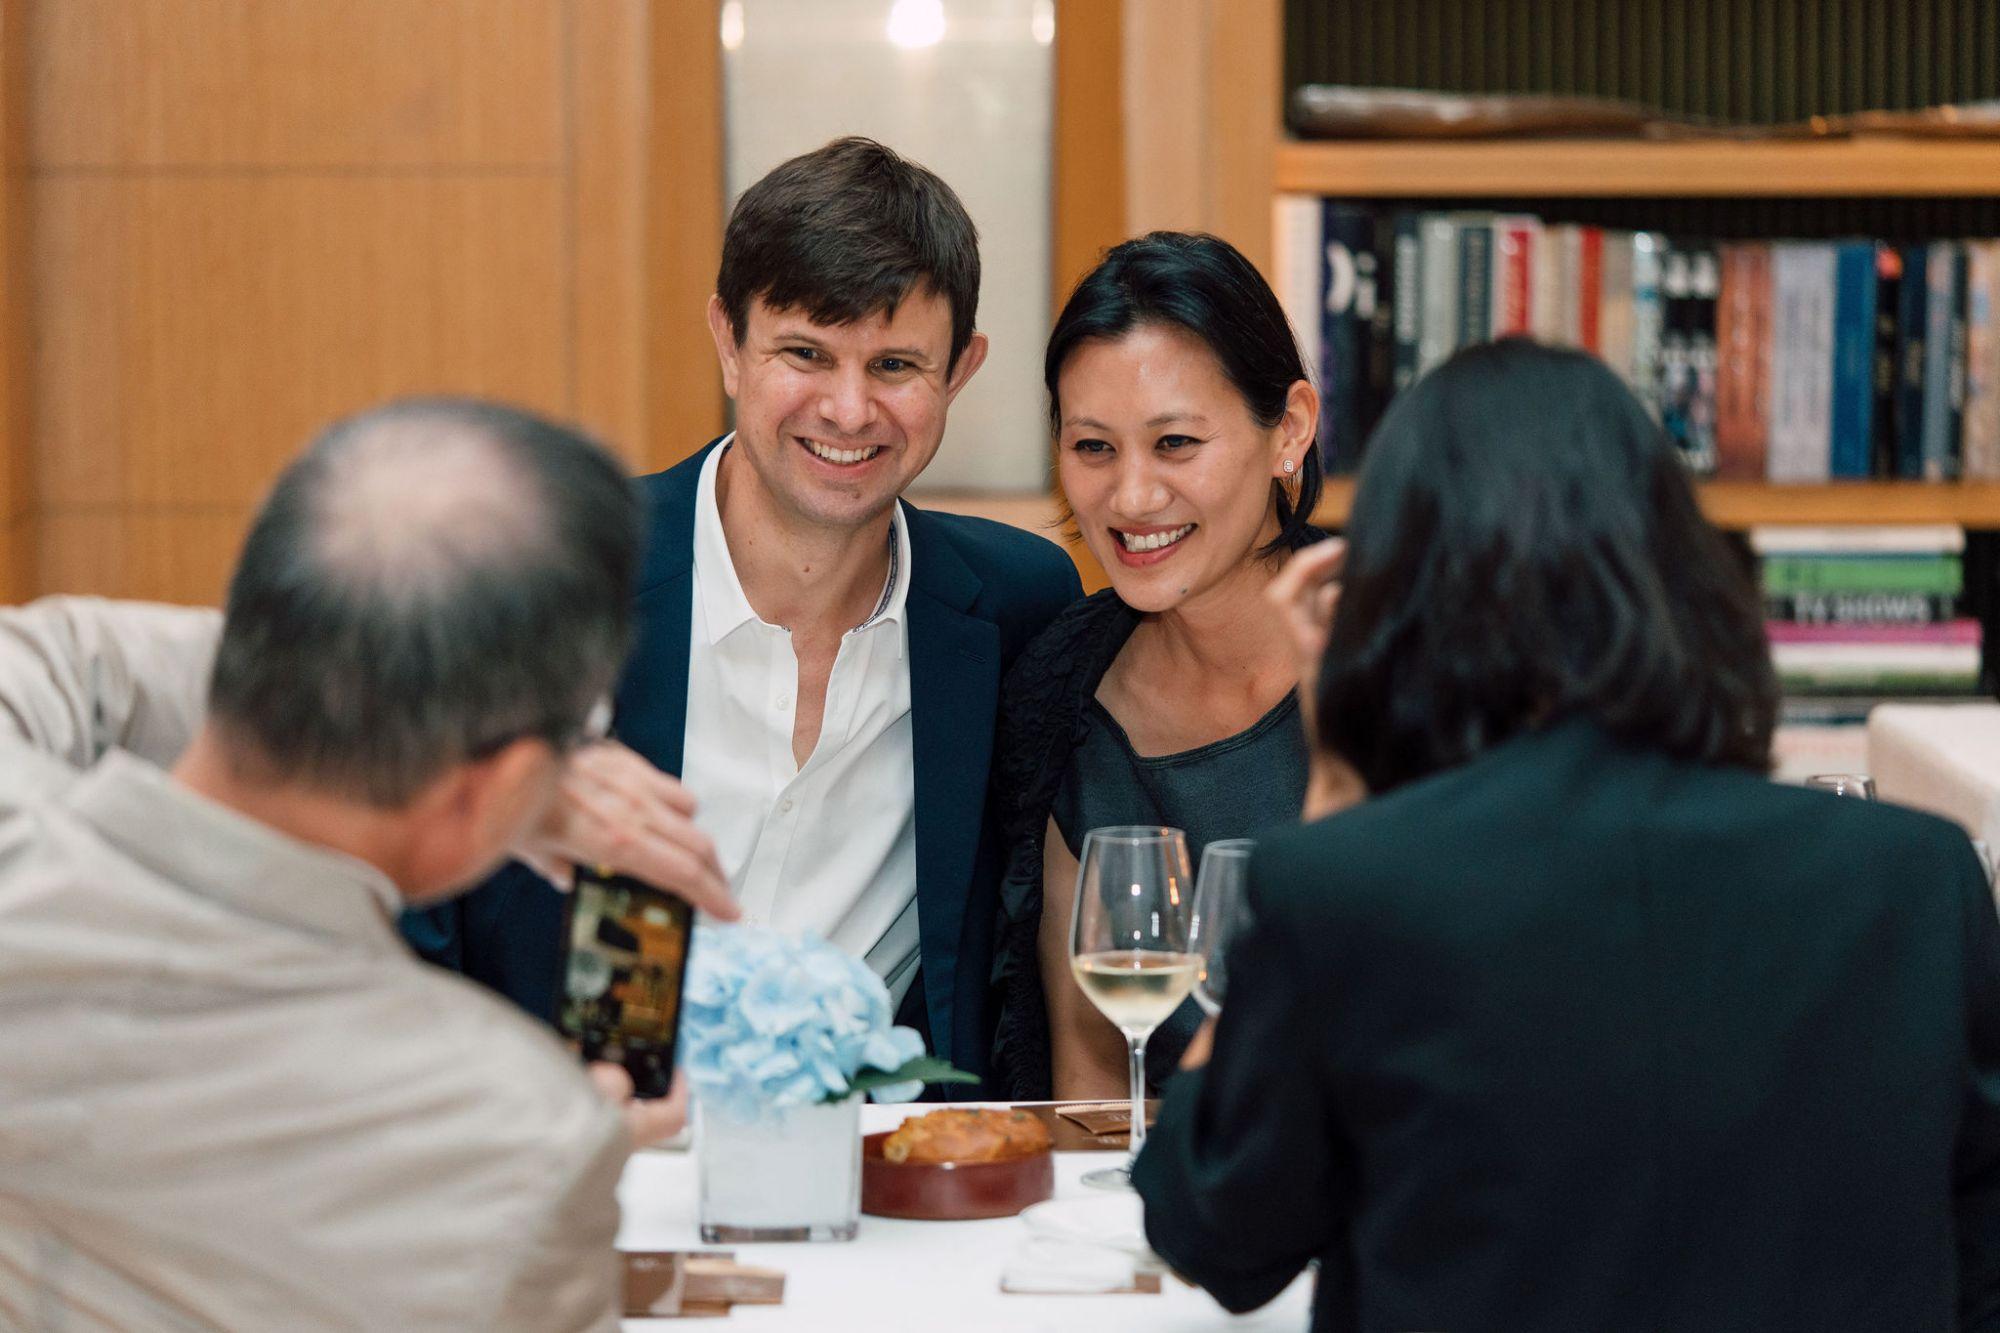 Eric Schuldenfrei and Marisa Yiu